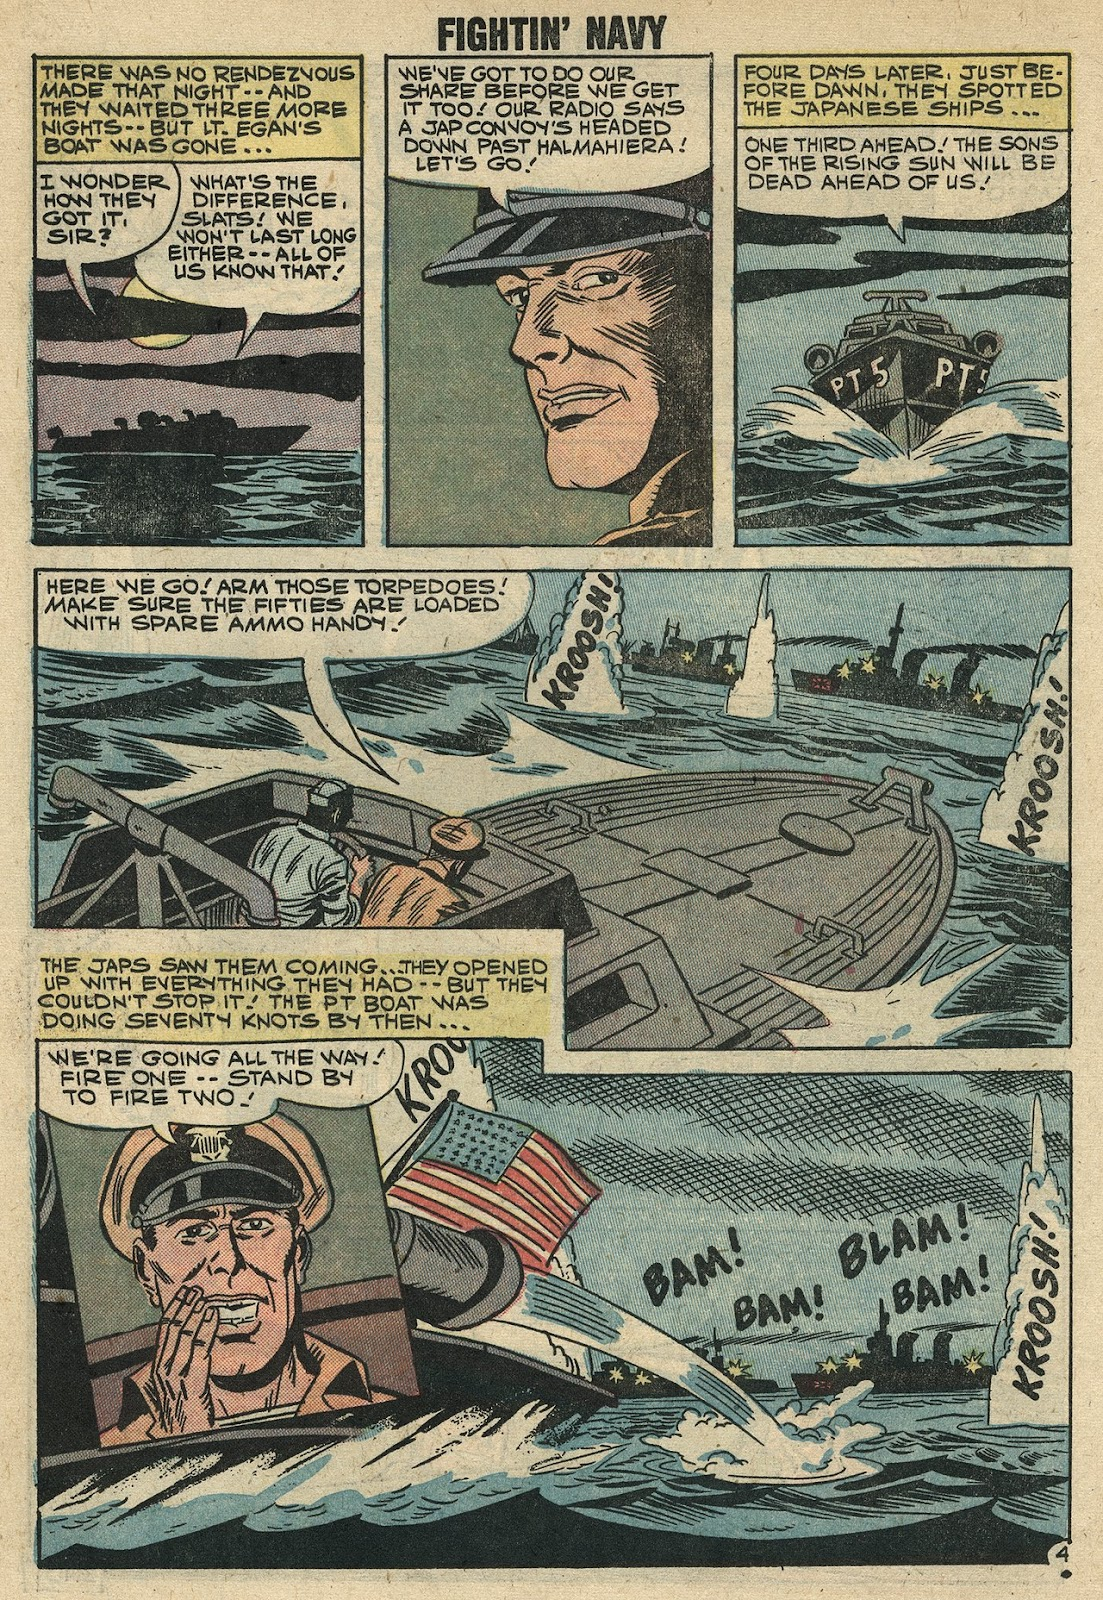 Read online Fightin' Navy comic -  Issue #86 - 18